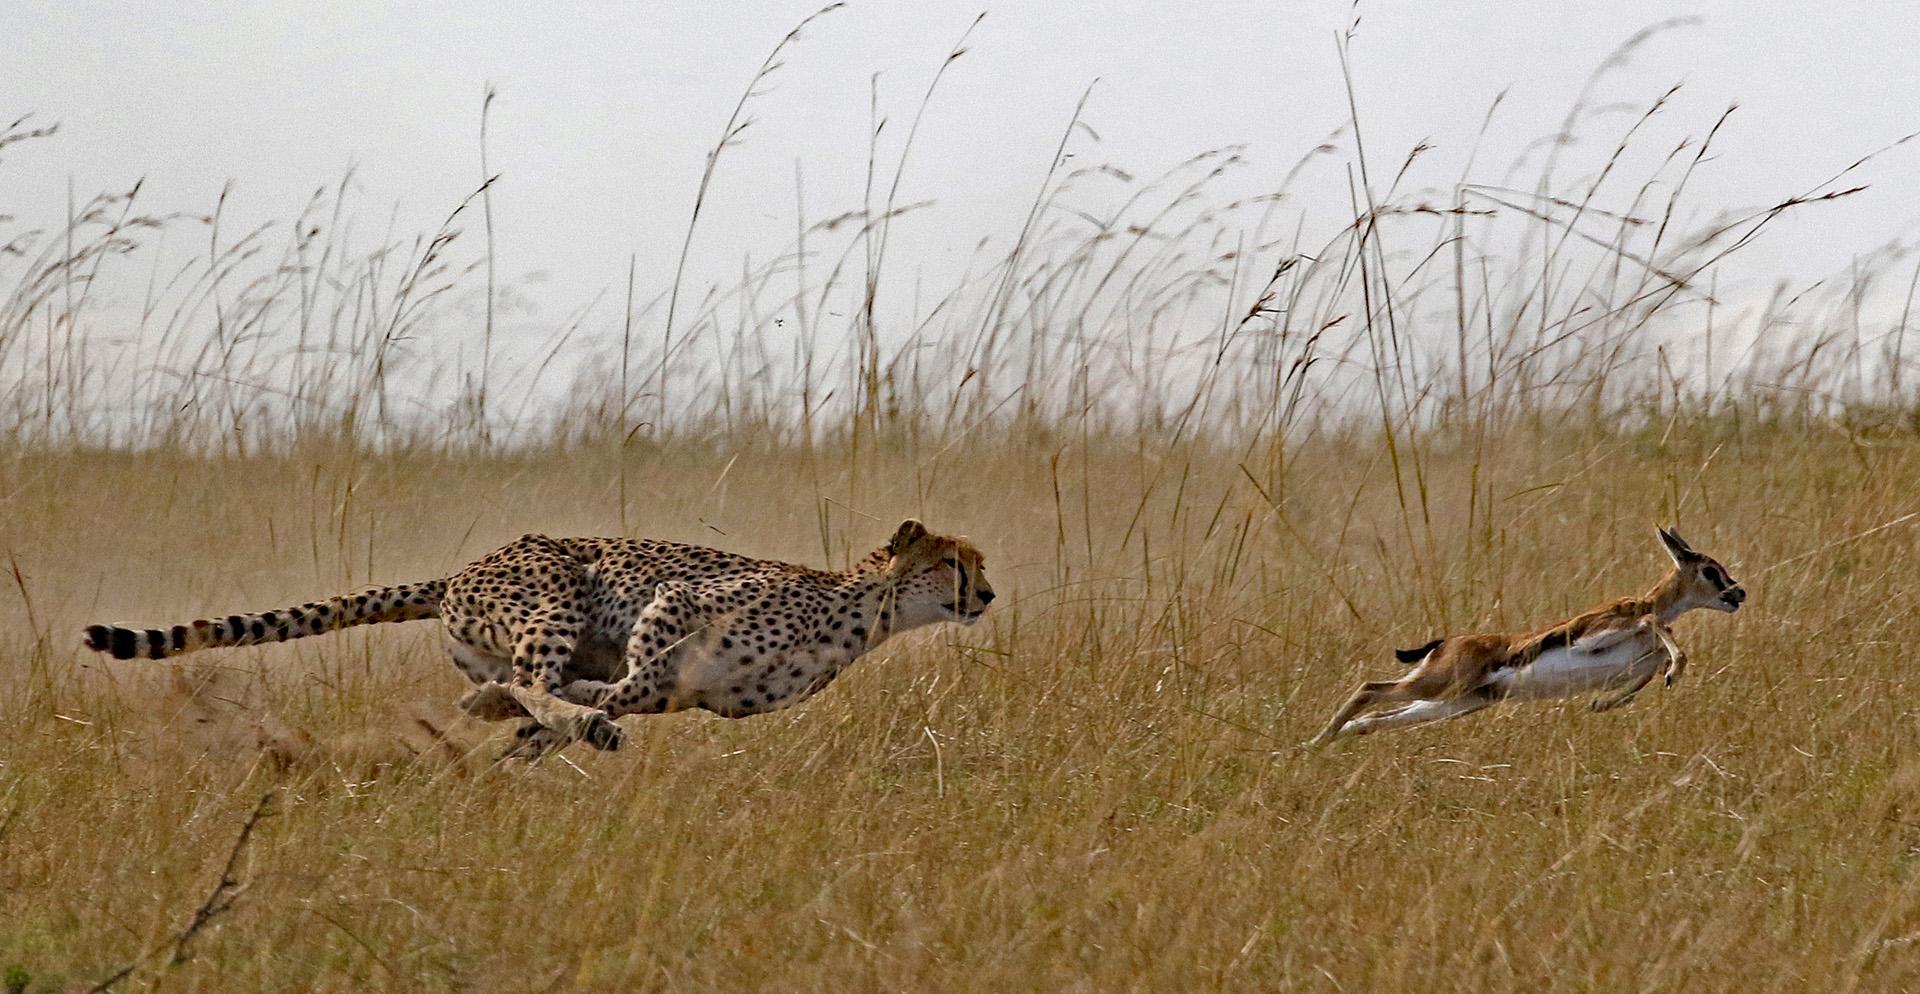 Cheetah hunting Gazelle